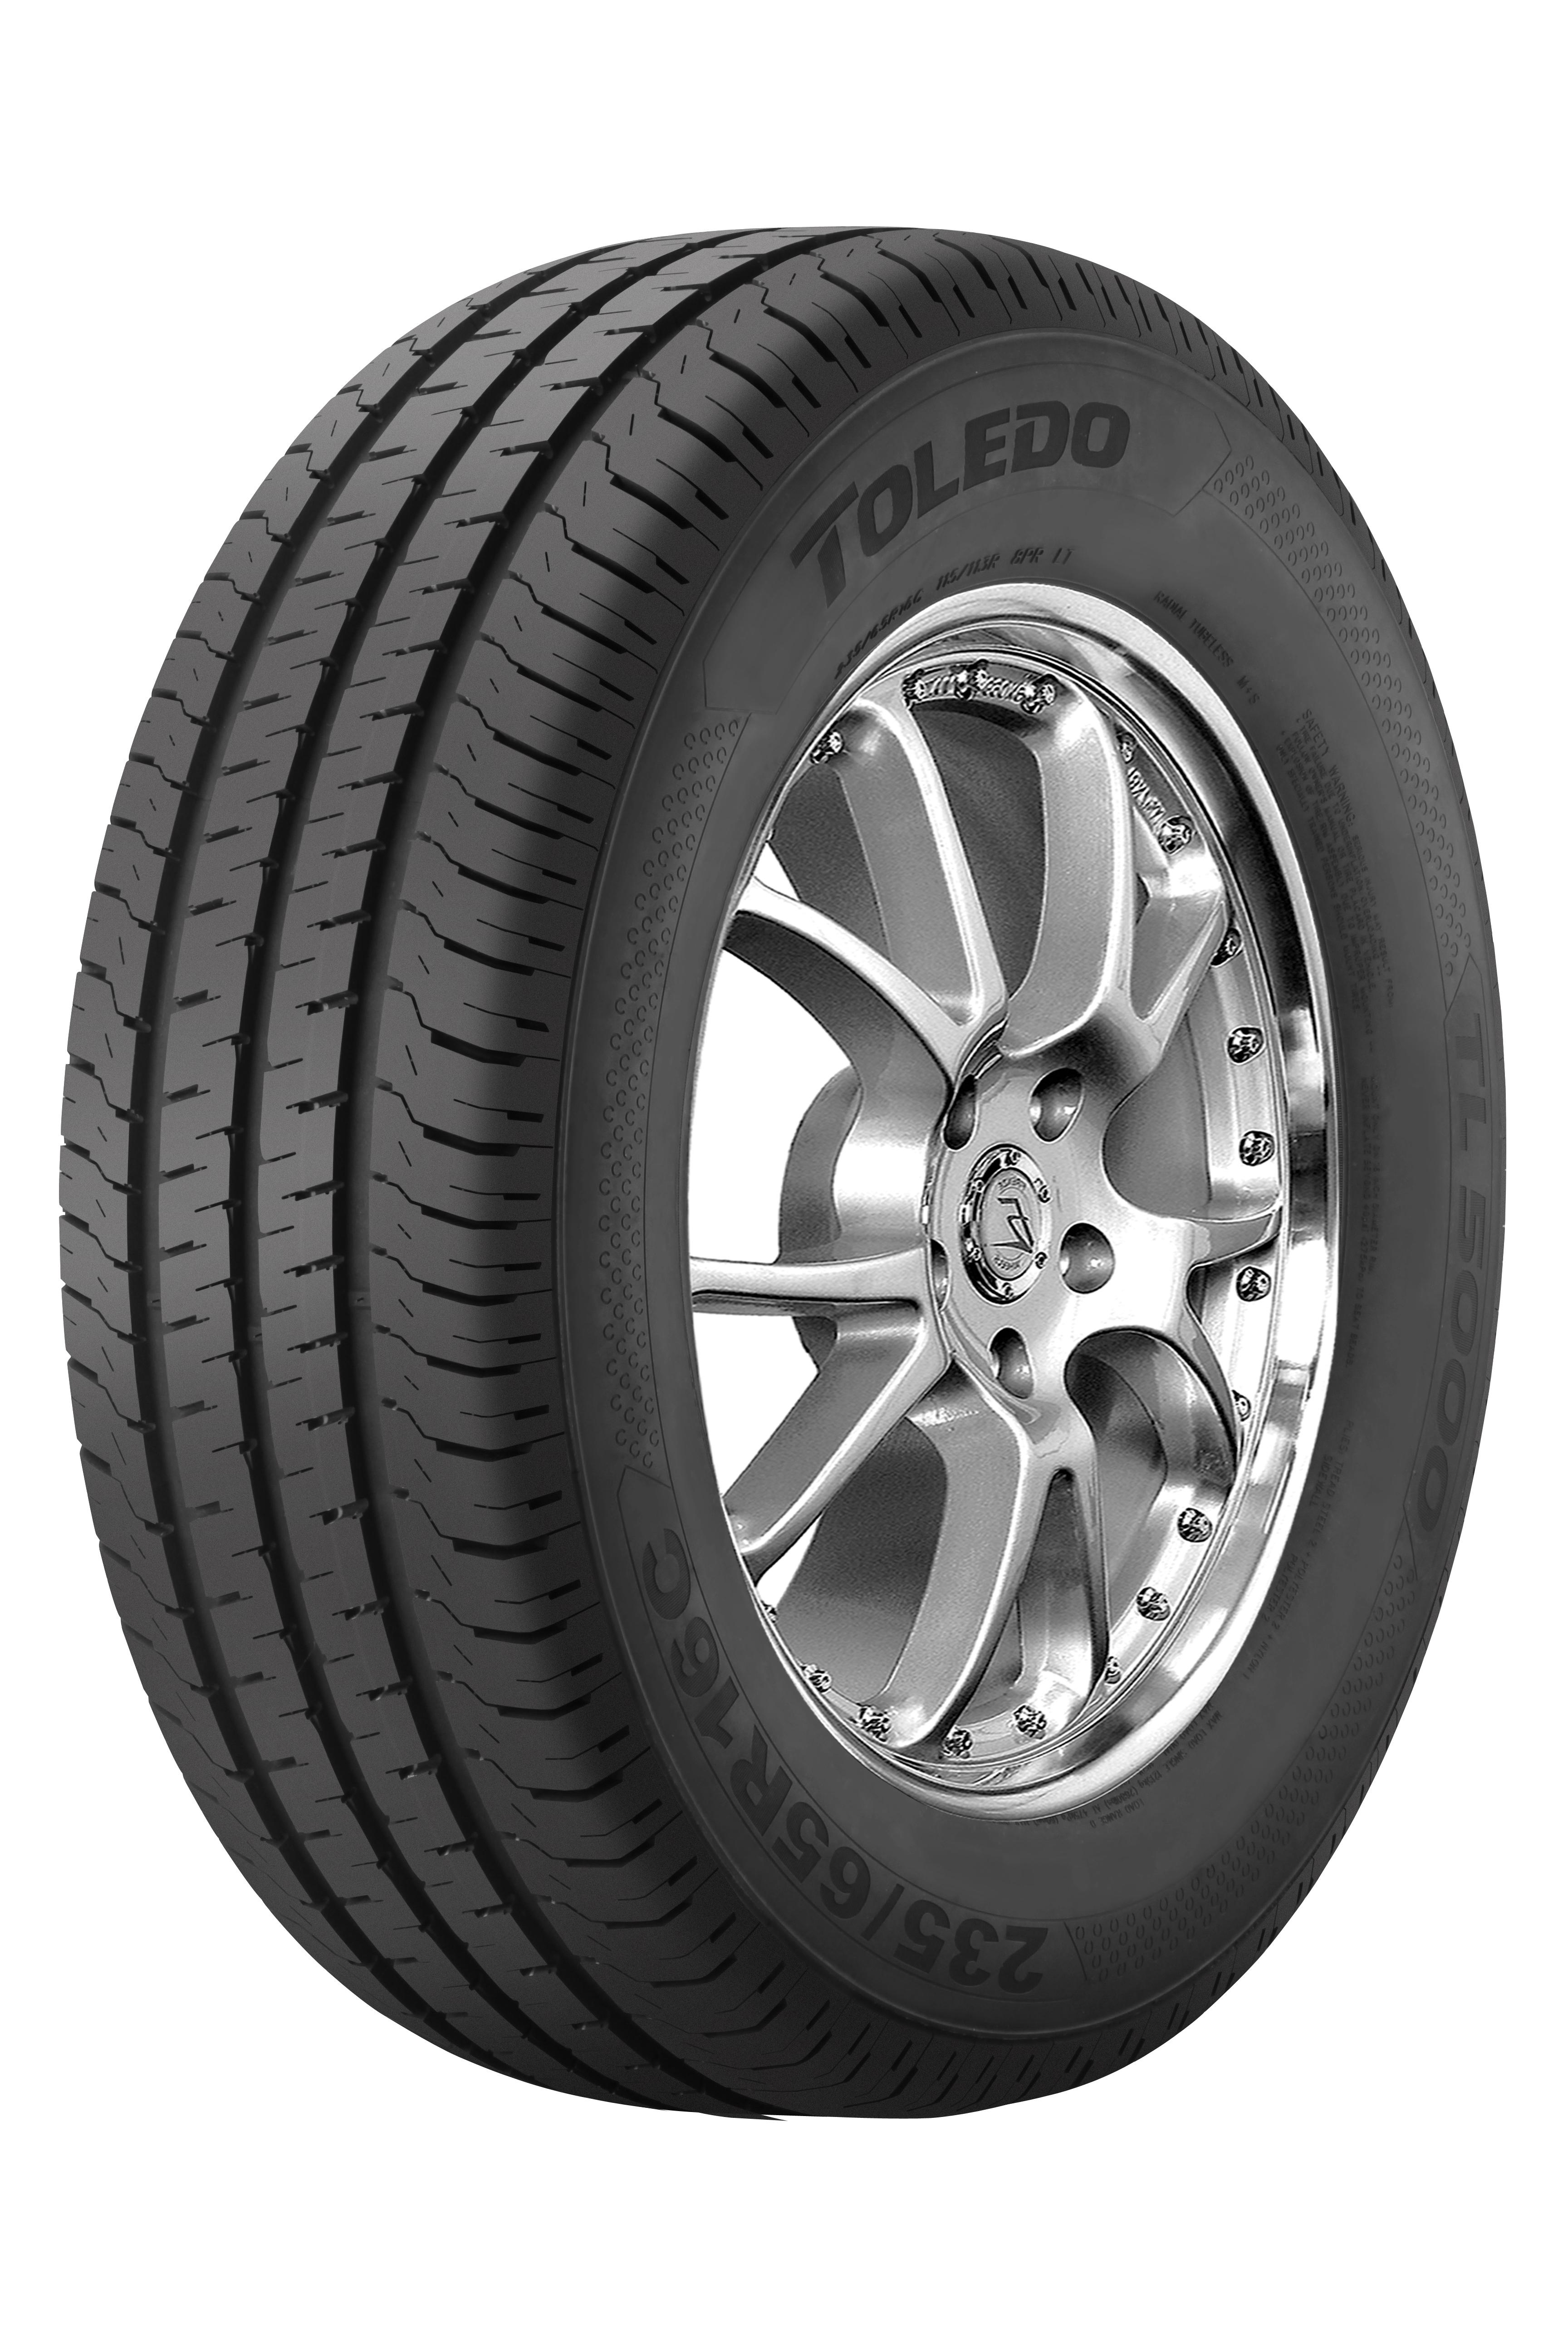 TOLEDO TL5000 Tyres